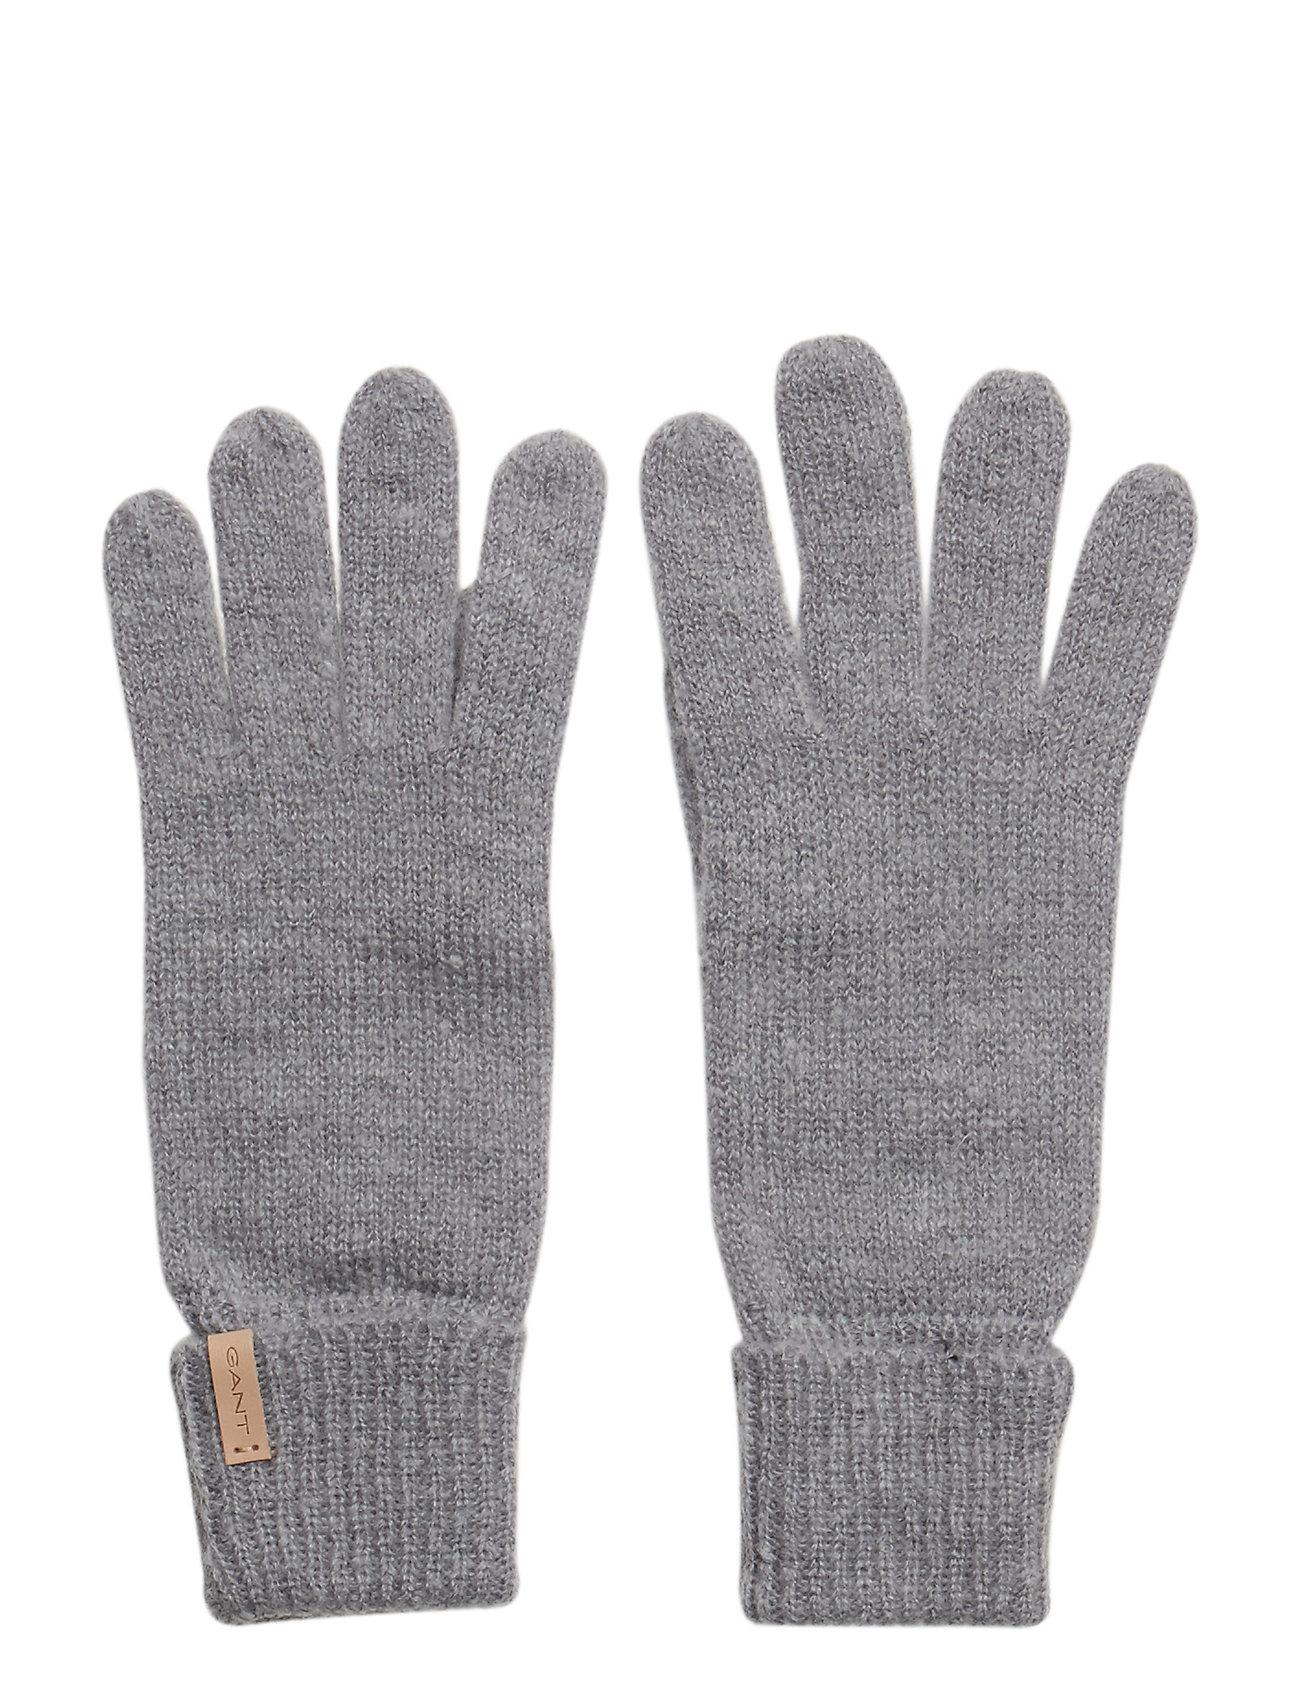 Image of O1. Knitted Gloves Handsker Grå GANT (3105944067)